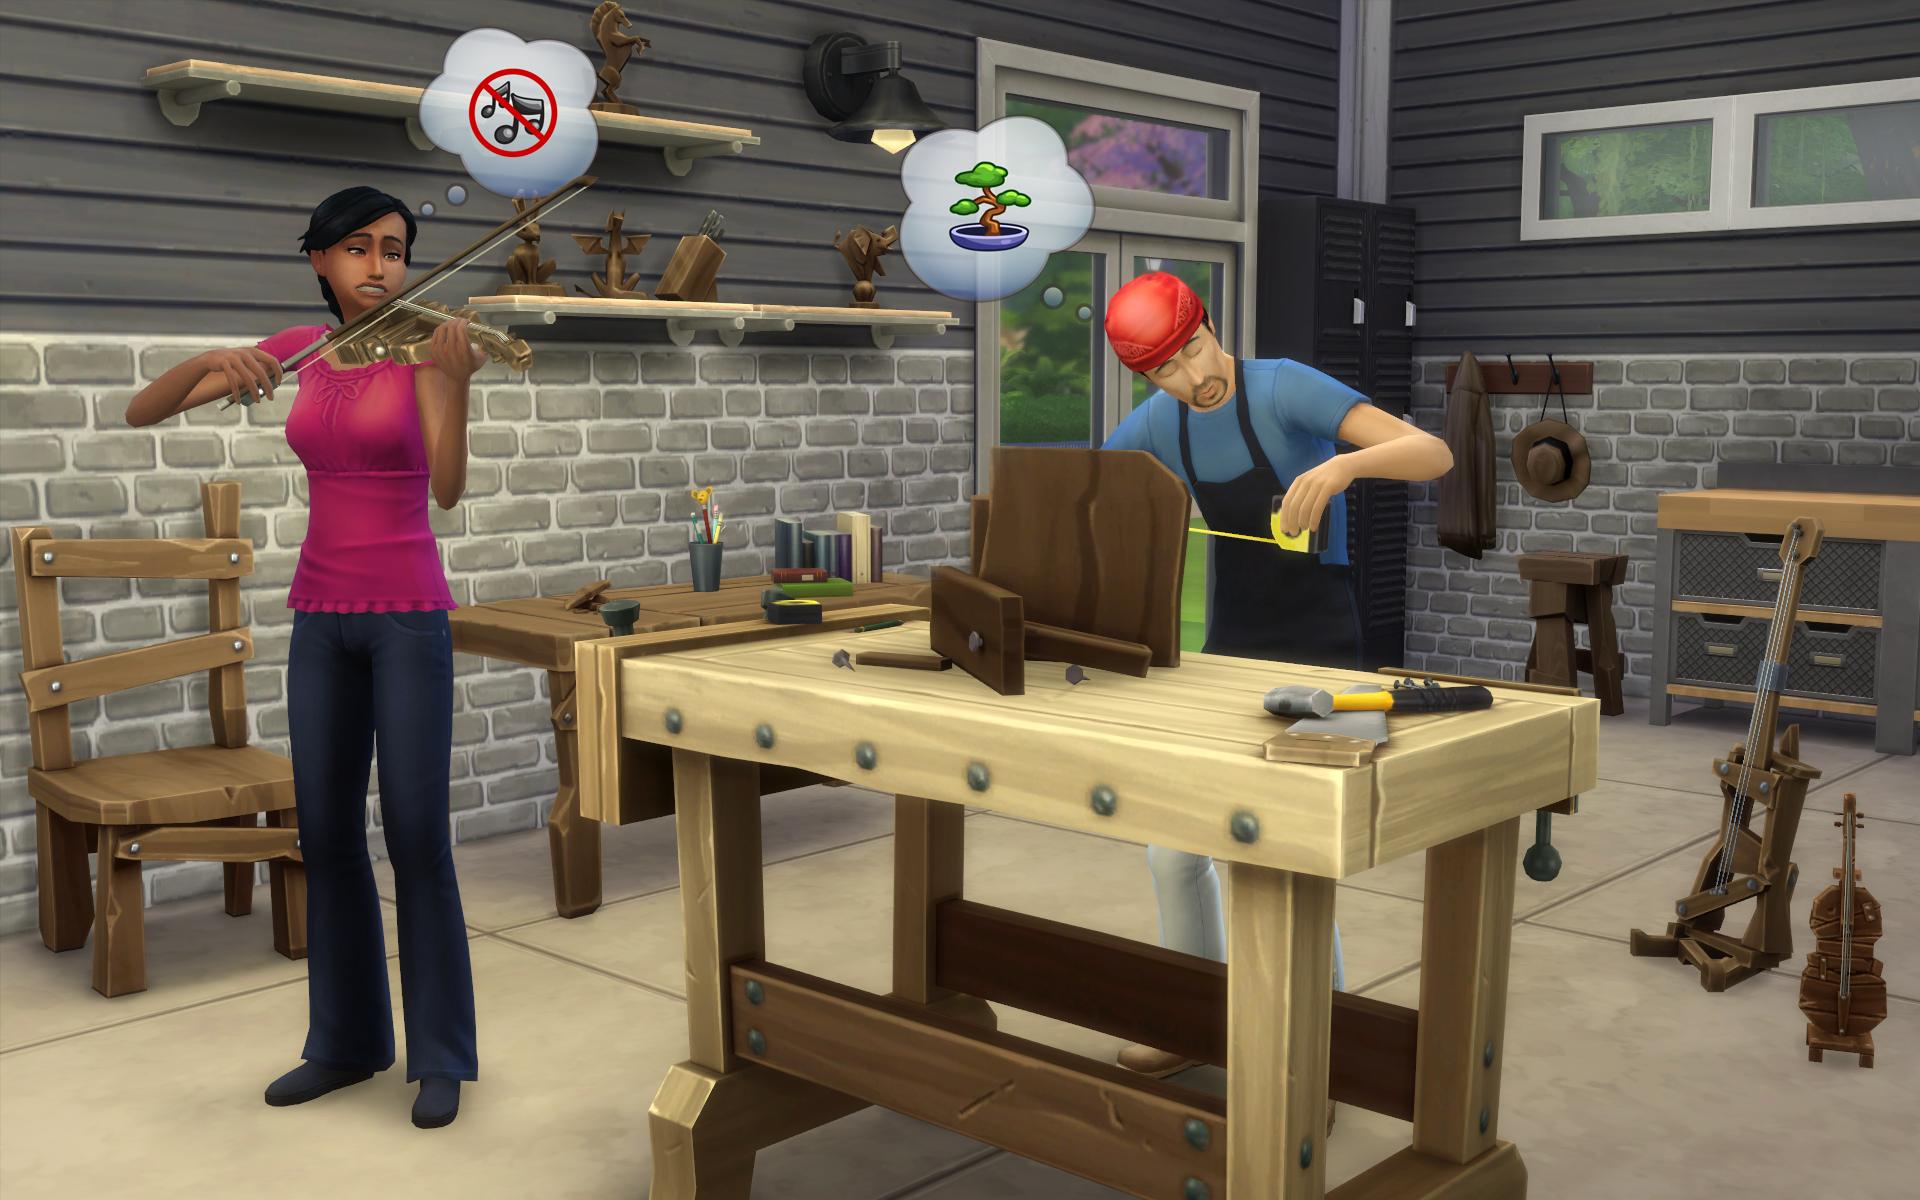 [Noticia]Reportajes de Los Sims 4: Pekesims 14633569409_0fd080ae04_o